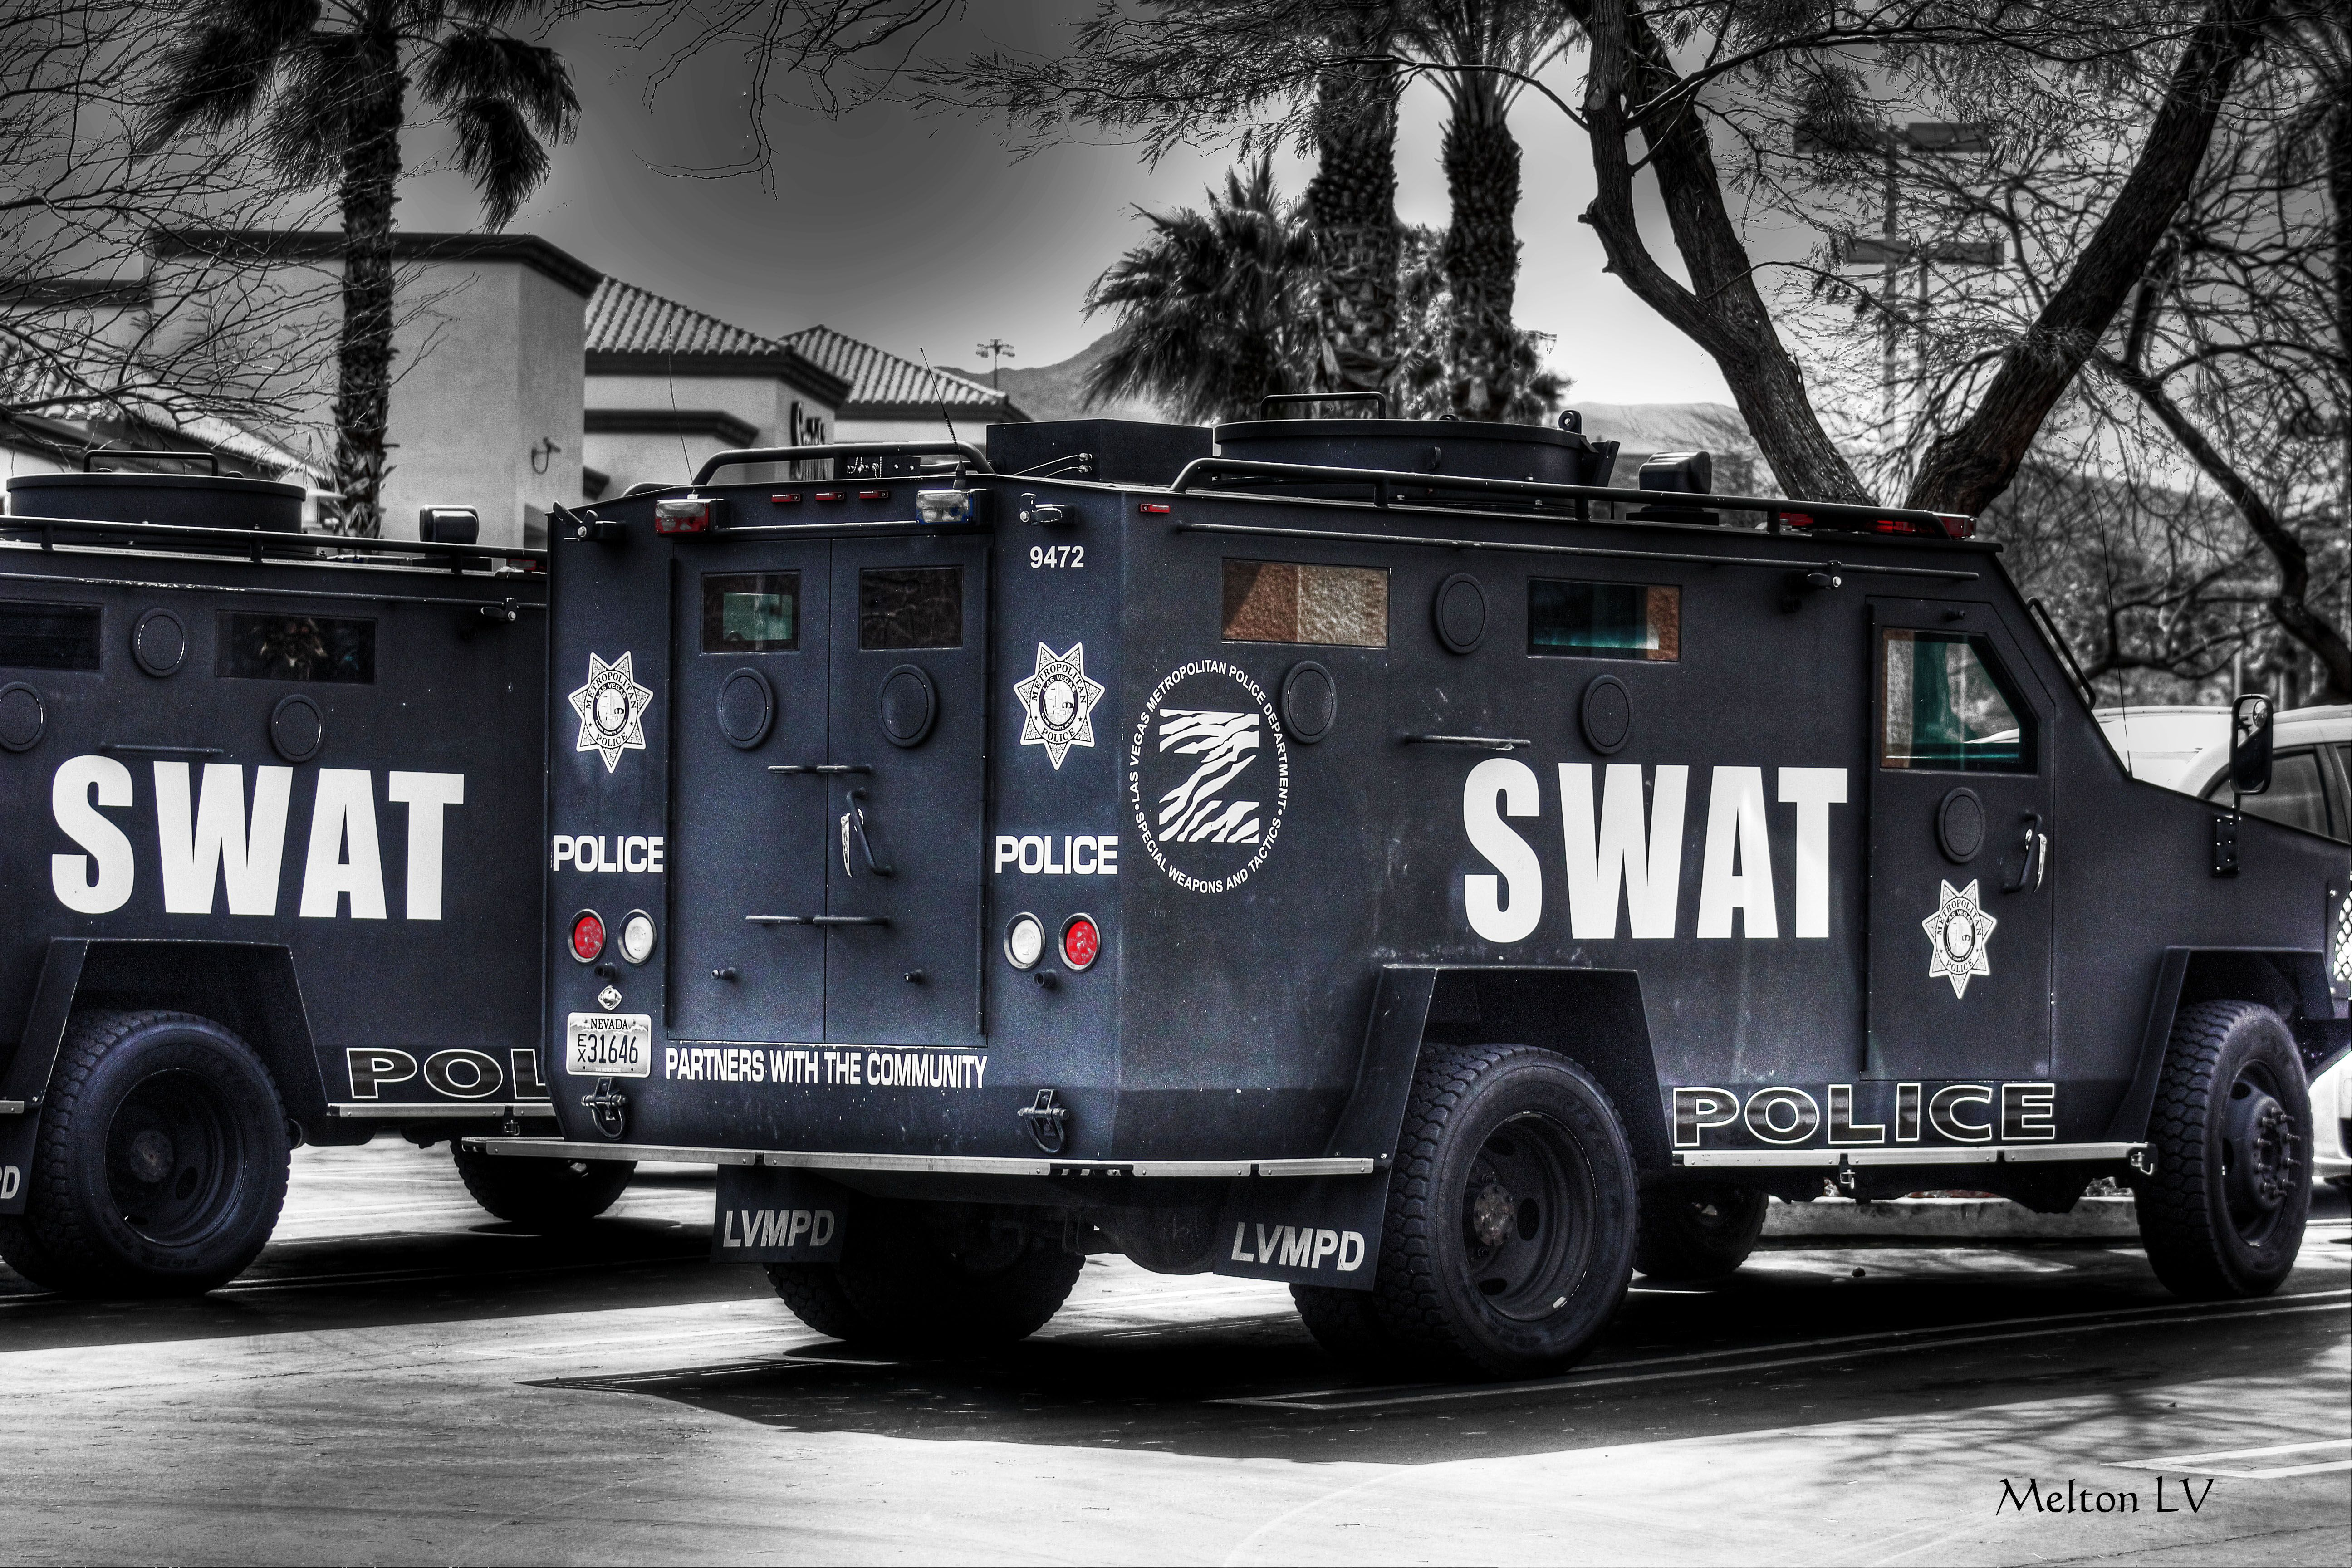 swat trucks police air sea land transportation